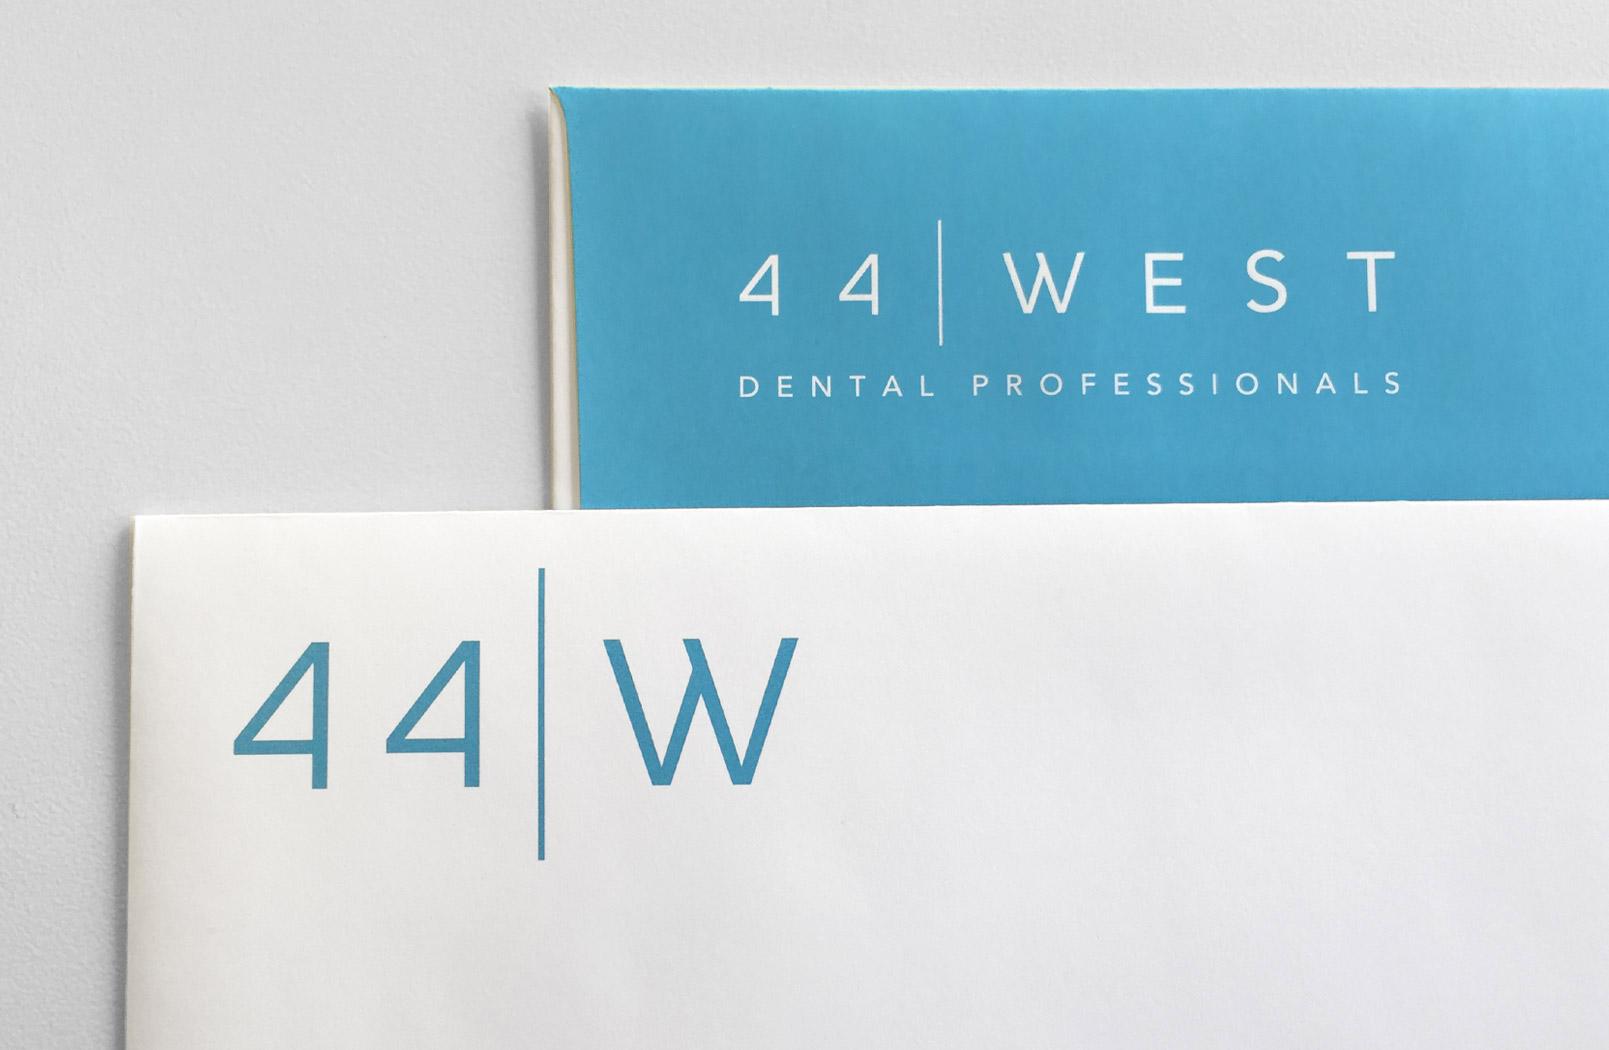 44W-Image-5